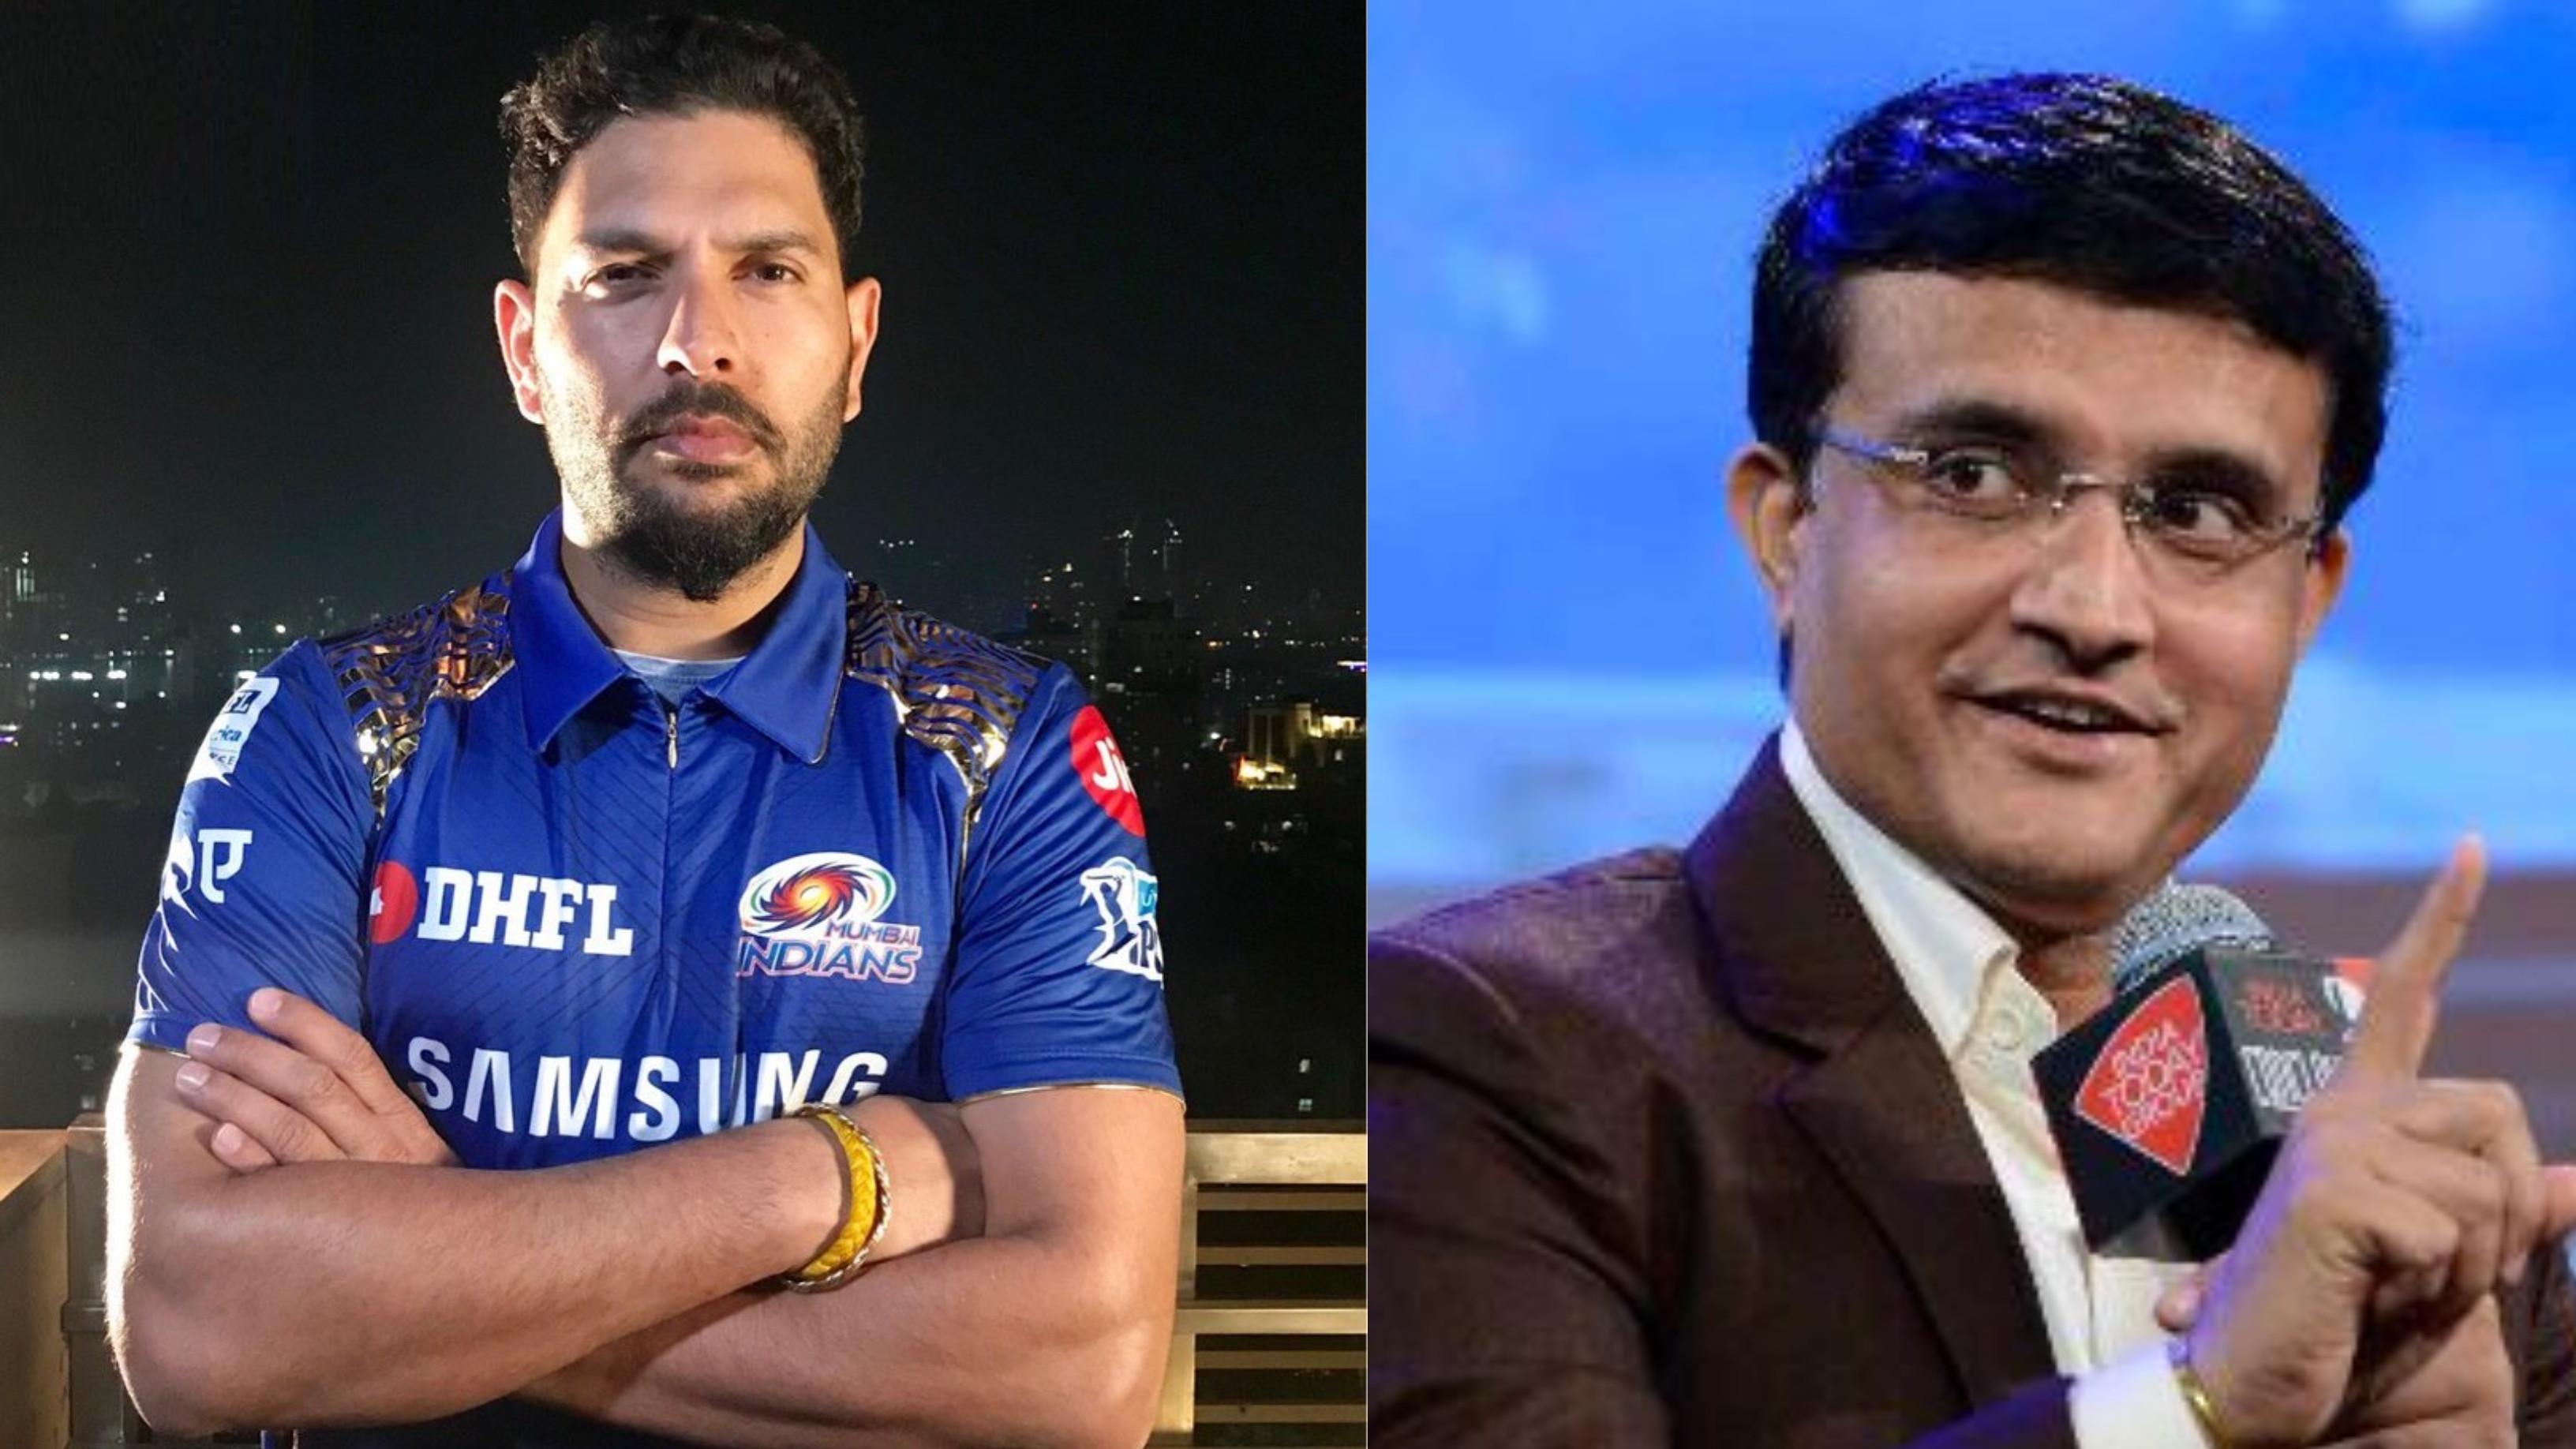 IPL 2019: Sourav Ganguly reacts on Yuvraj Singh joining Mumbai Indians for next season